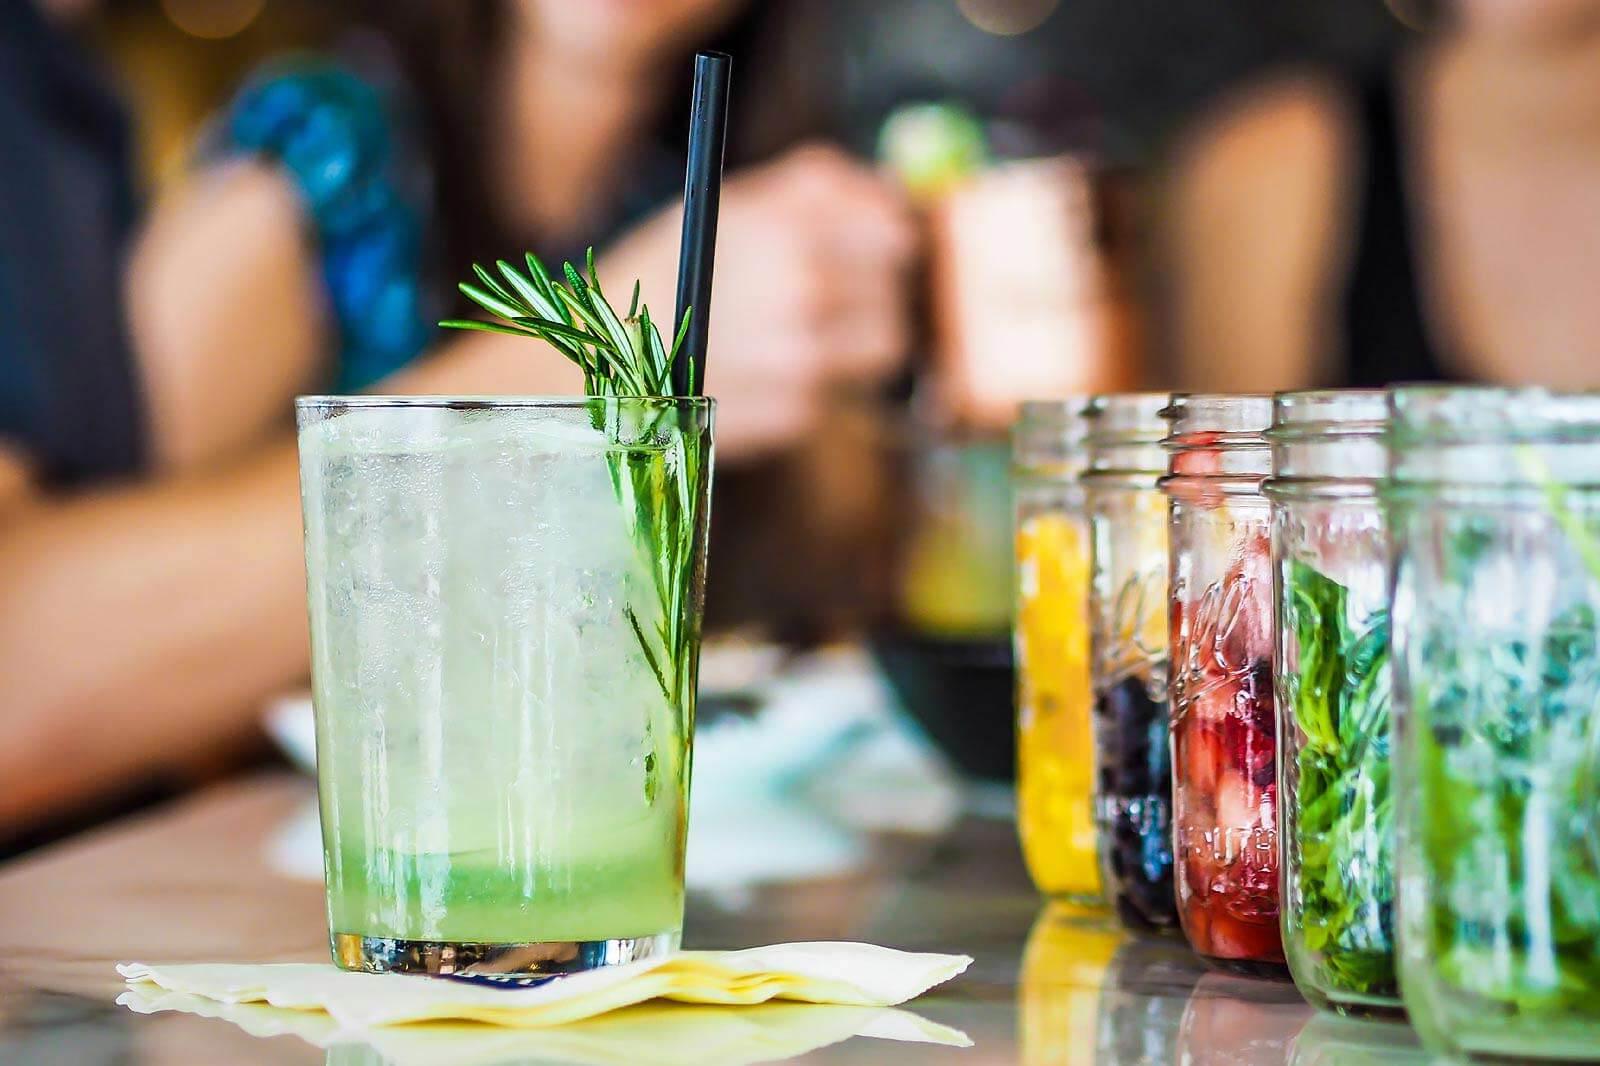 Lemongrass Drink Image